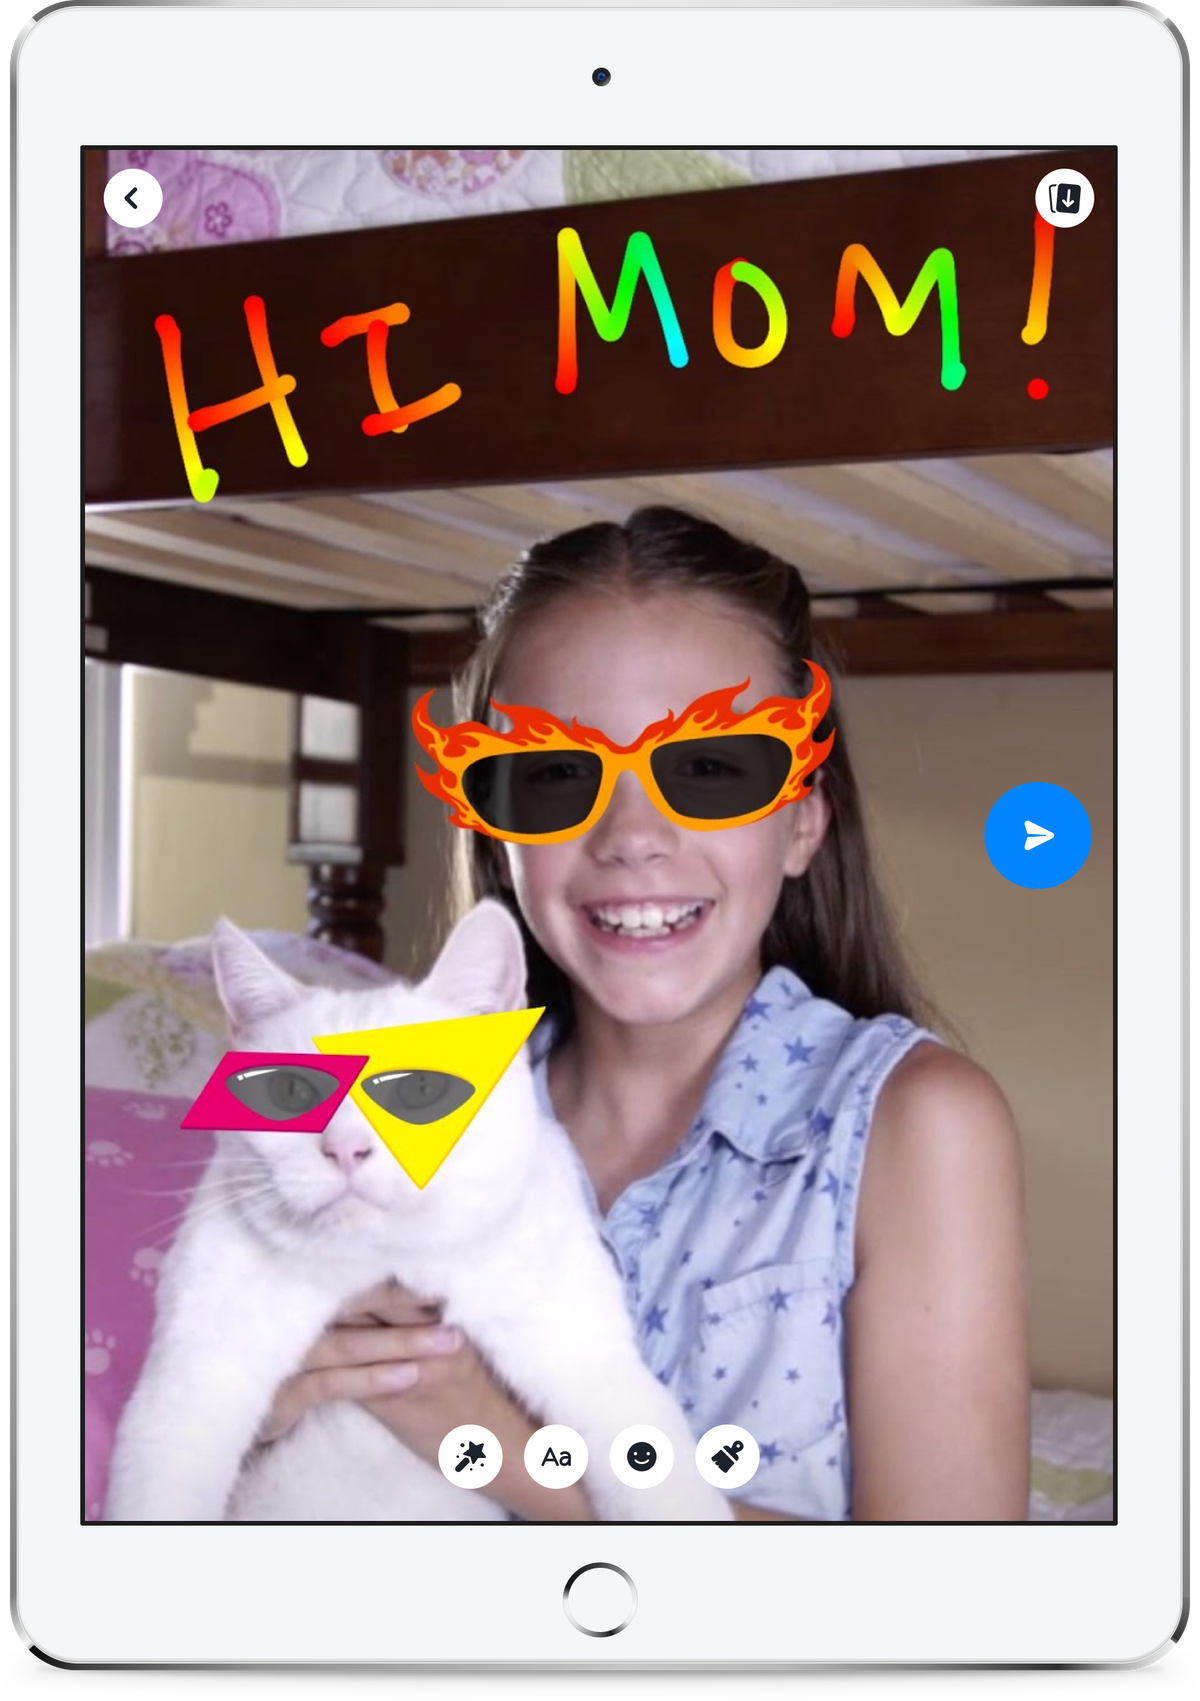 Facebook's new Messenger app for pre-teens.